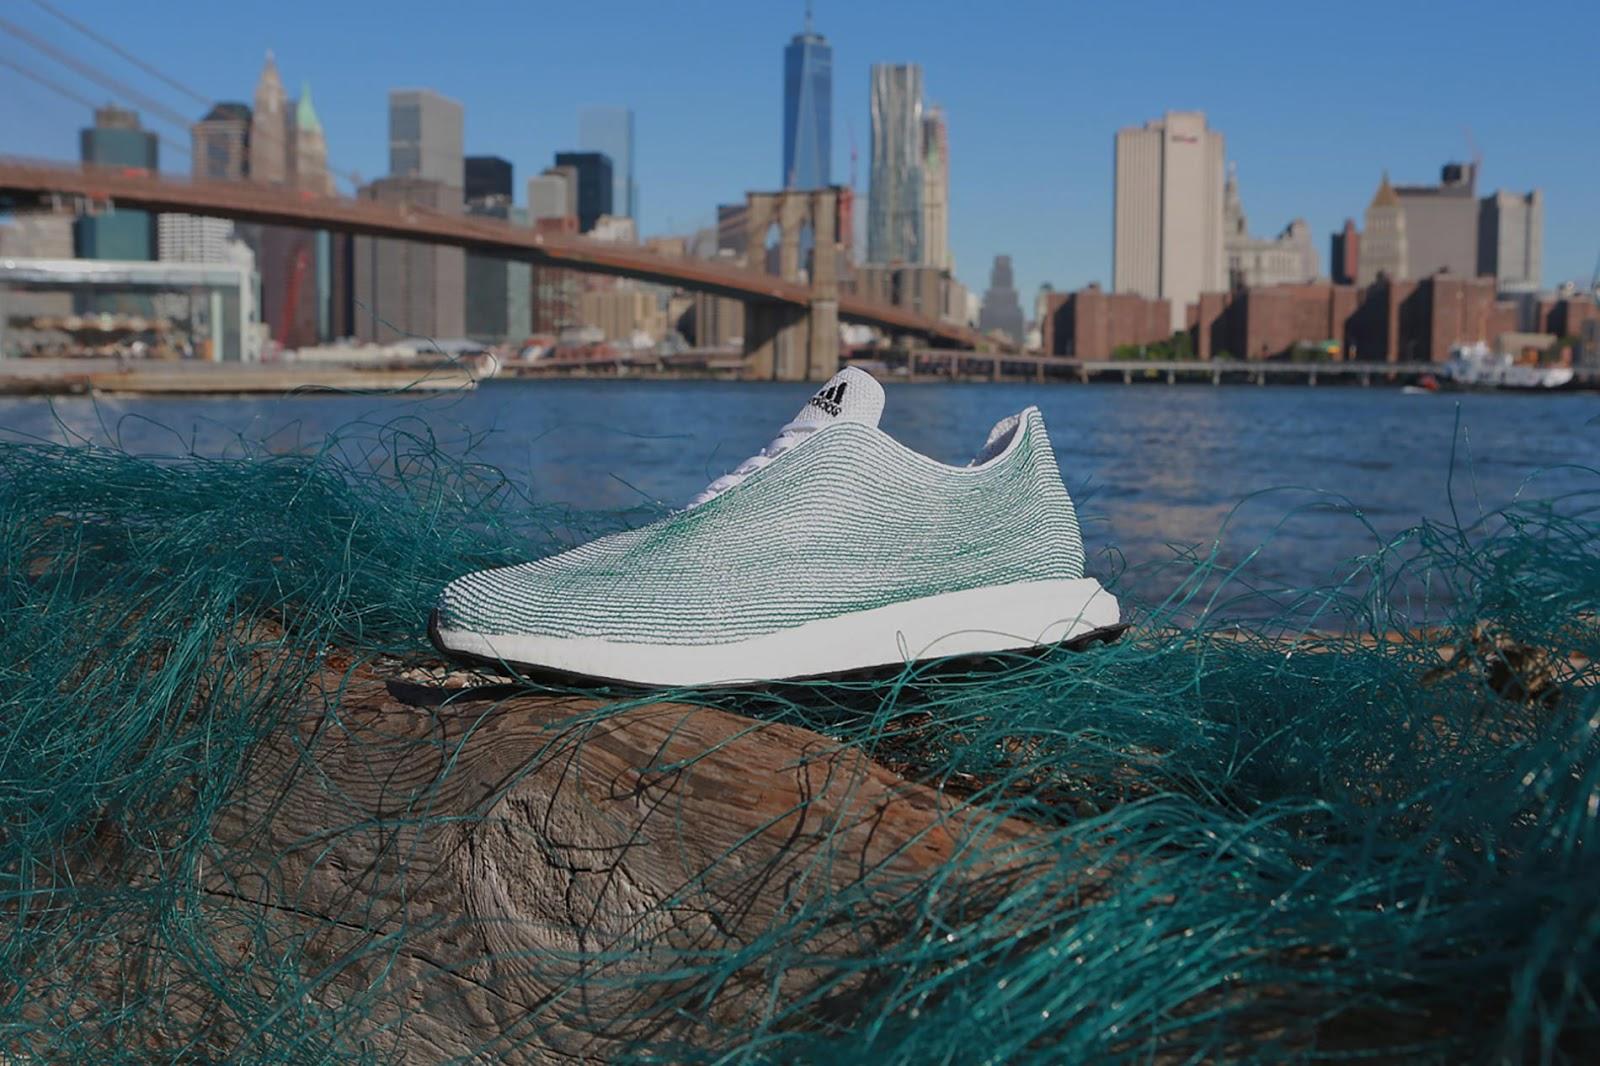 Scarpe sostenibili AdidasxParley ricavate da rifiuti e reti da ...